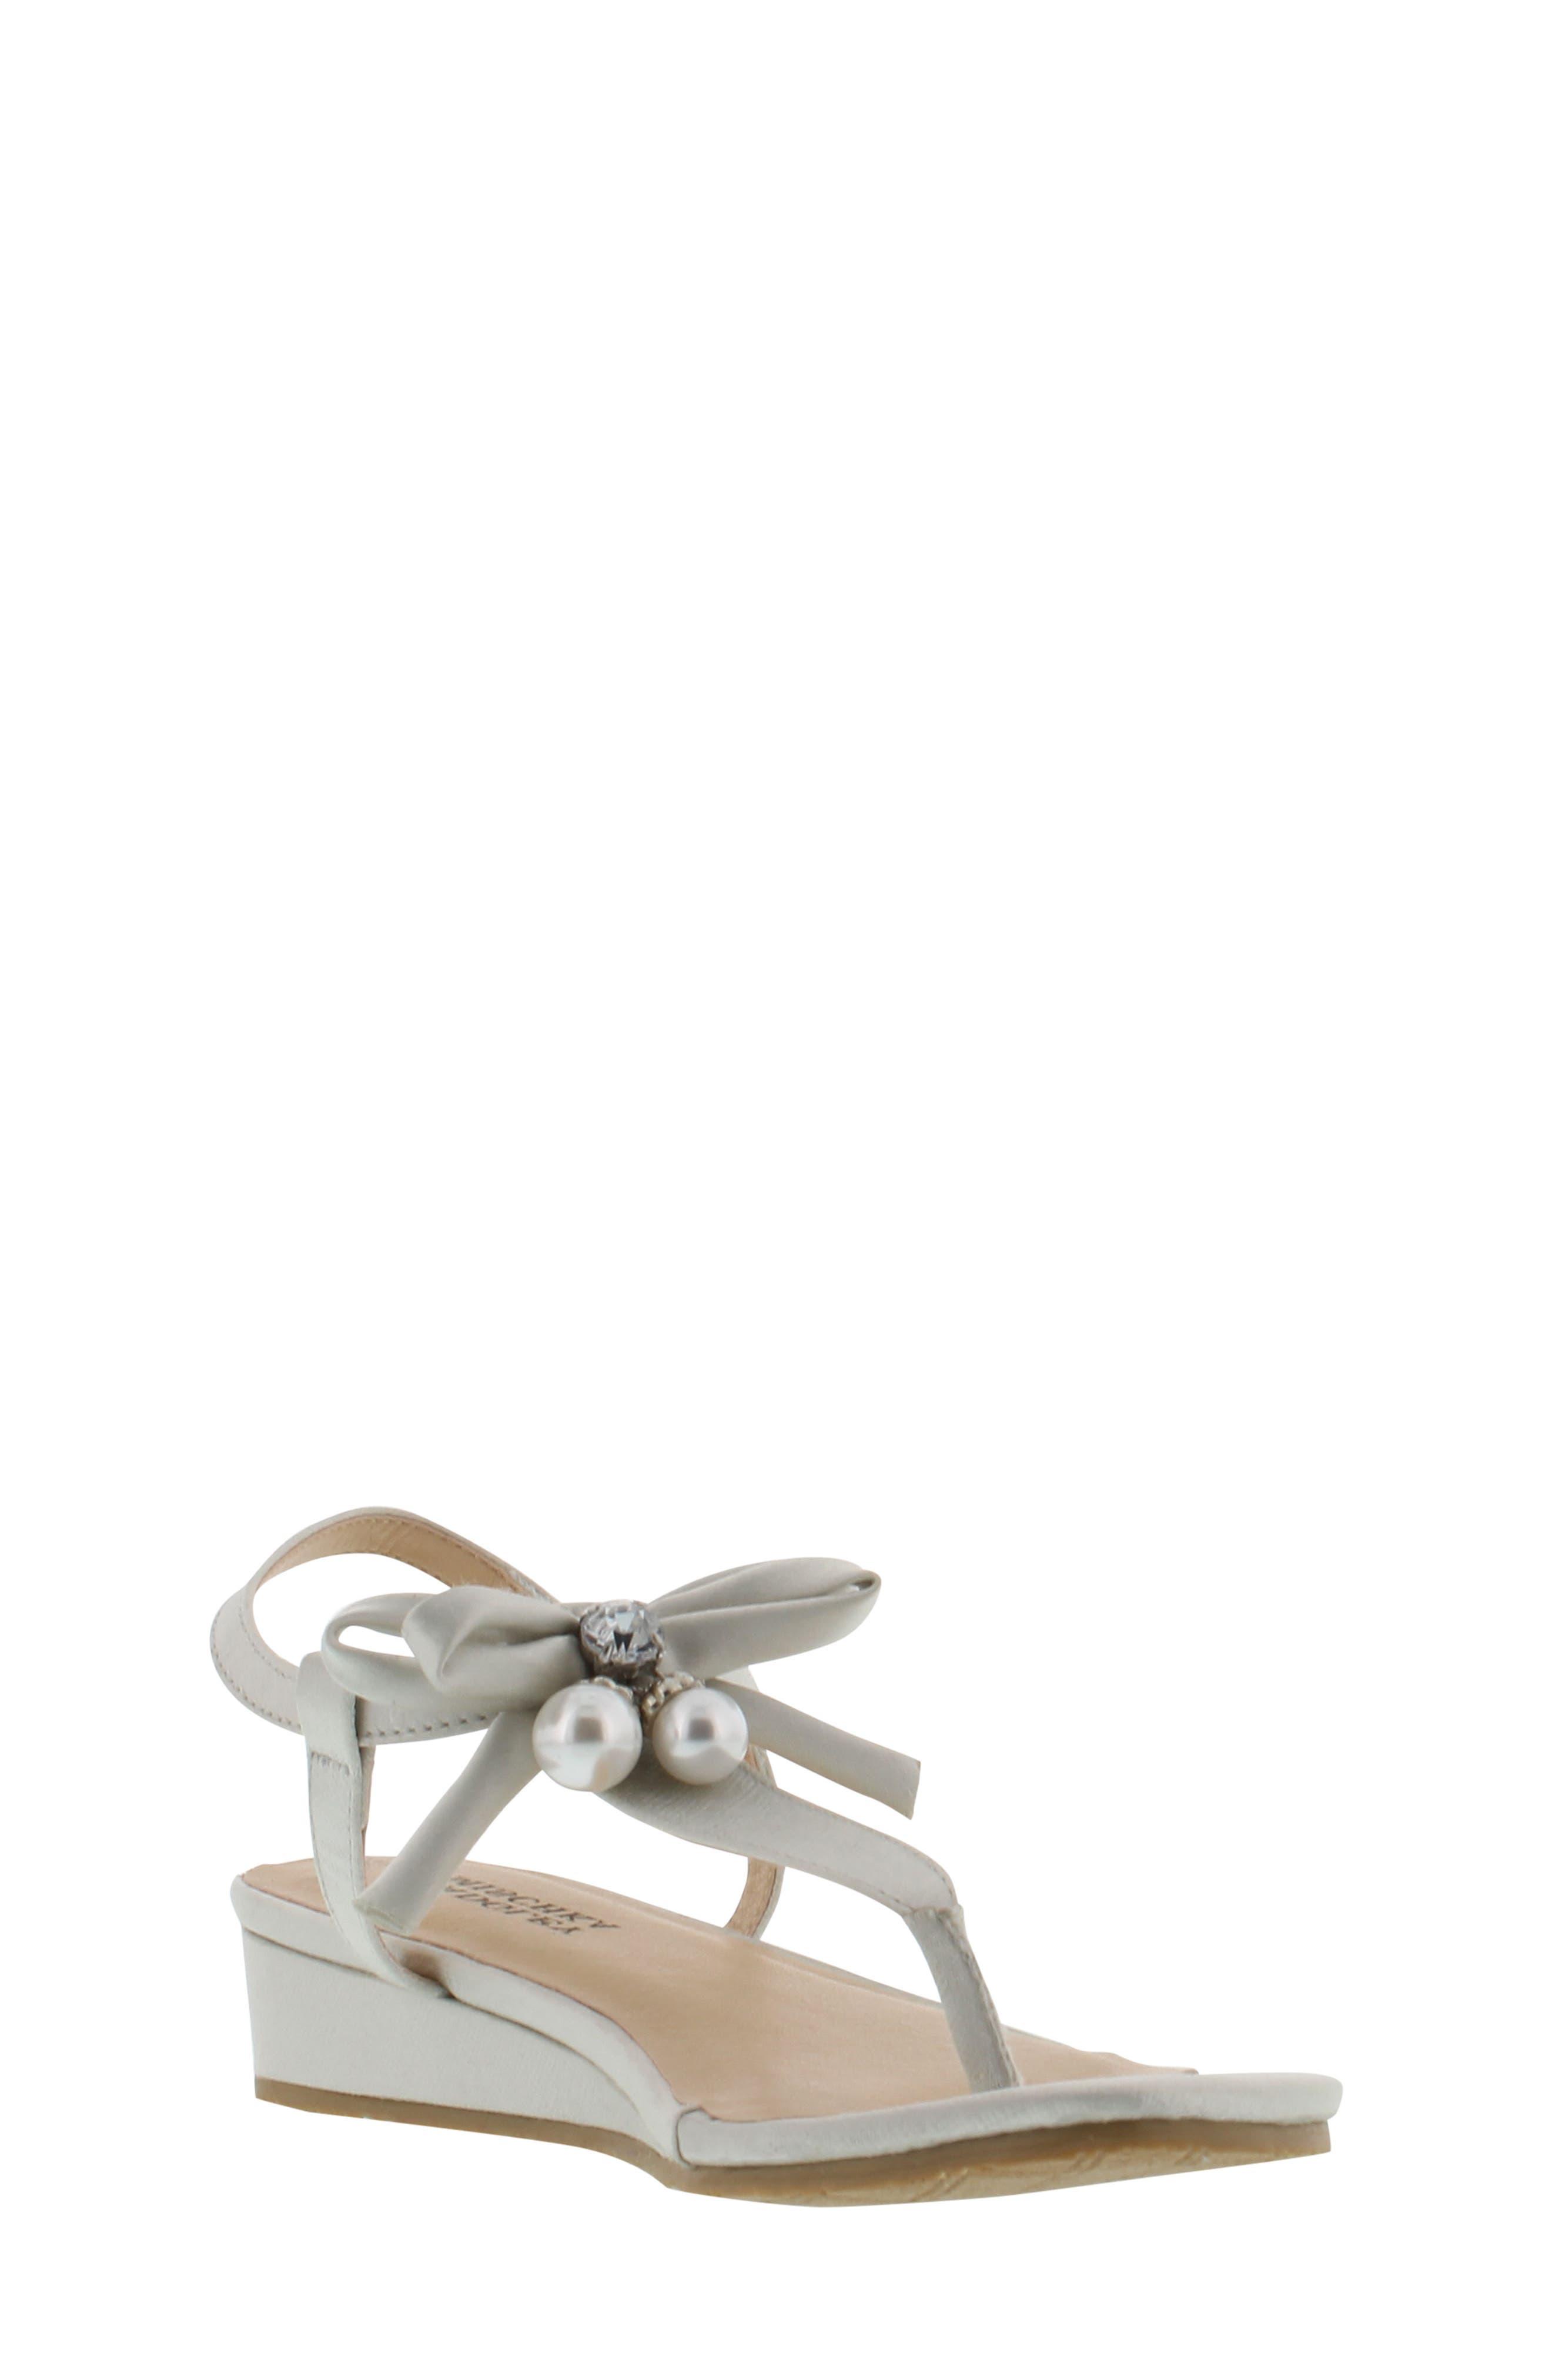 Talia Embellished Bow Sandal,                             Main thumbnail 1, color,                             040